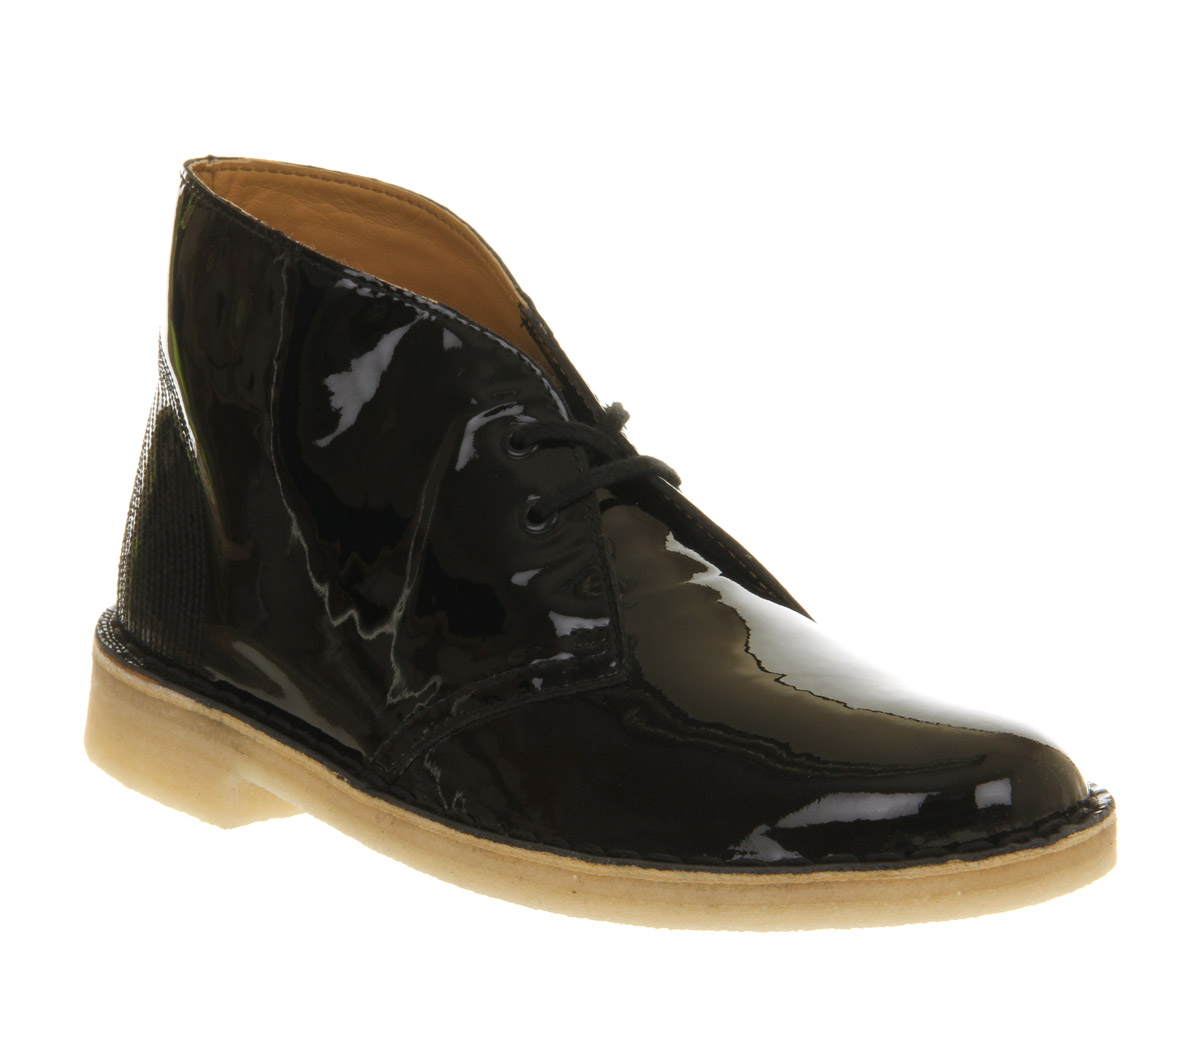 womens clarks originals desert boot black patent boots ebay. Black Bedroom Furniture Sets. Home Design Ideas